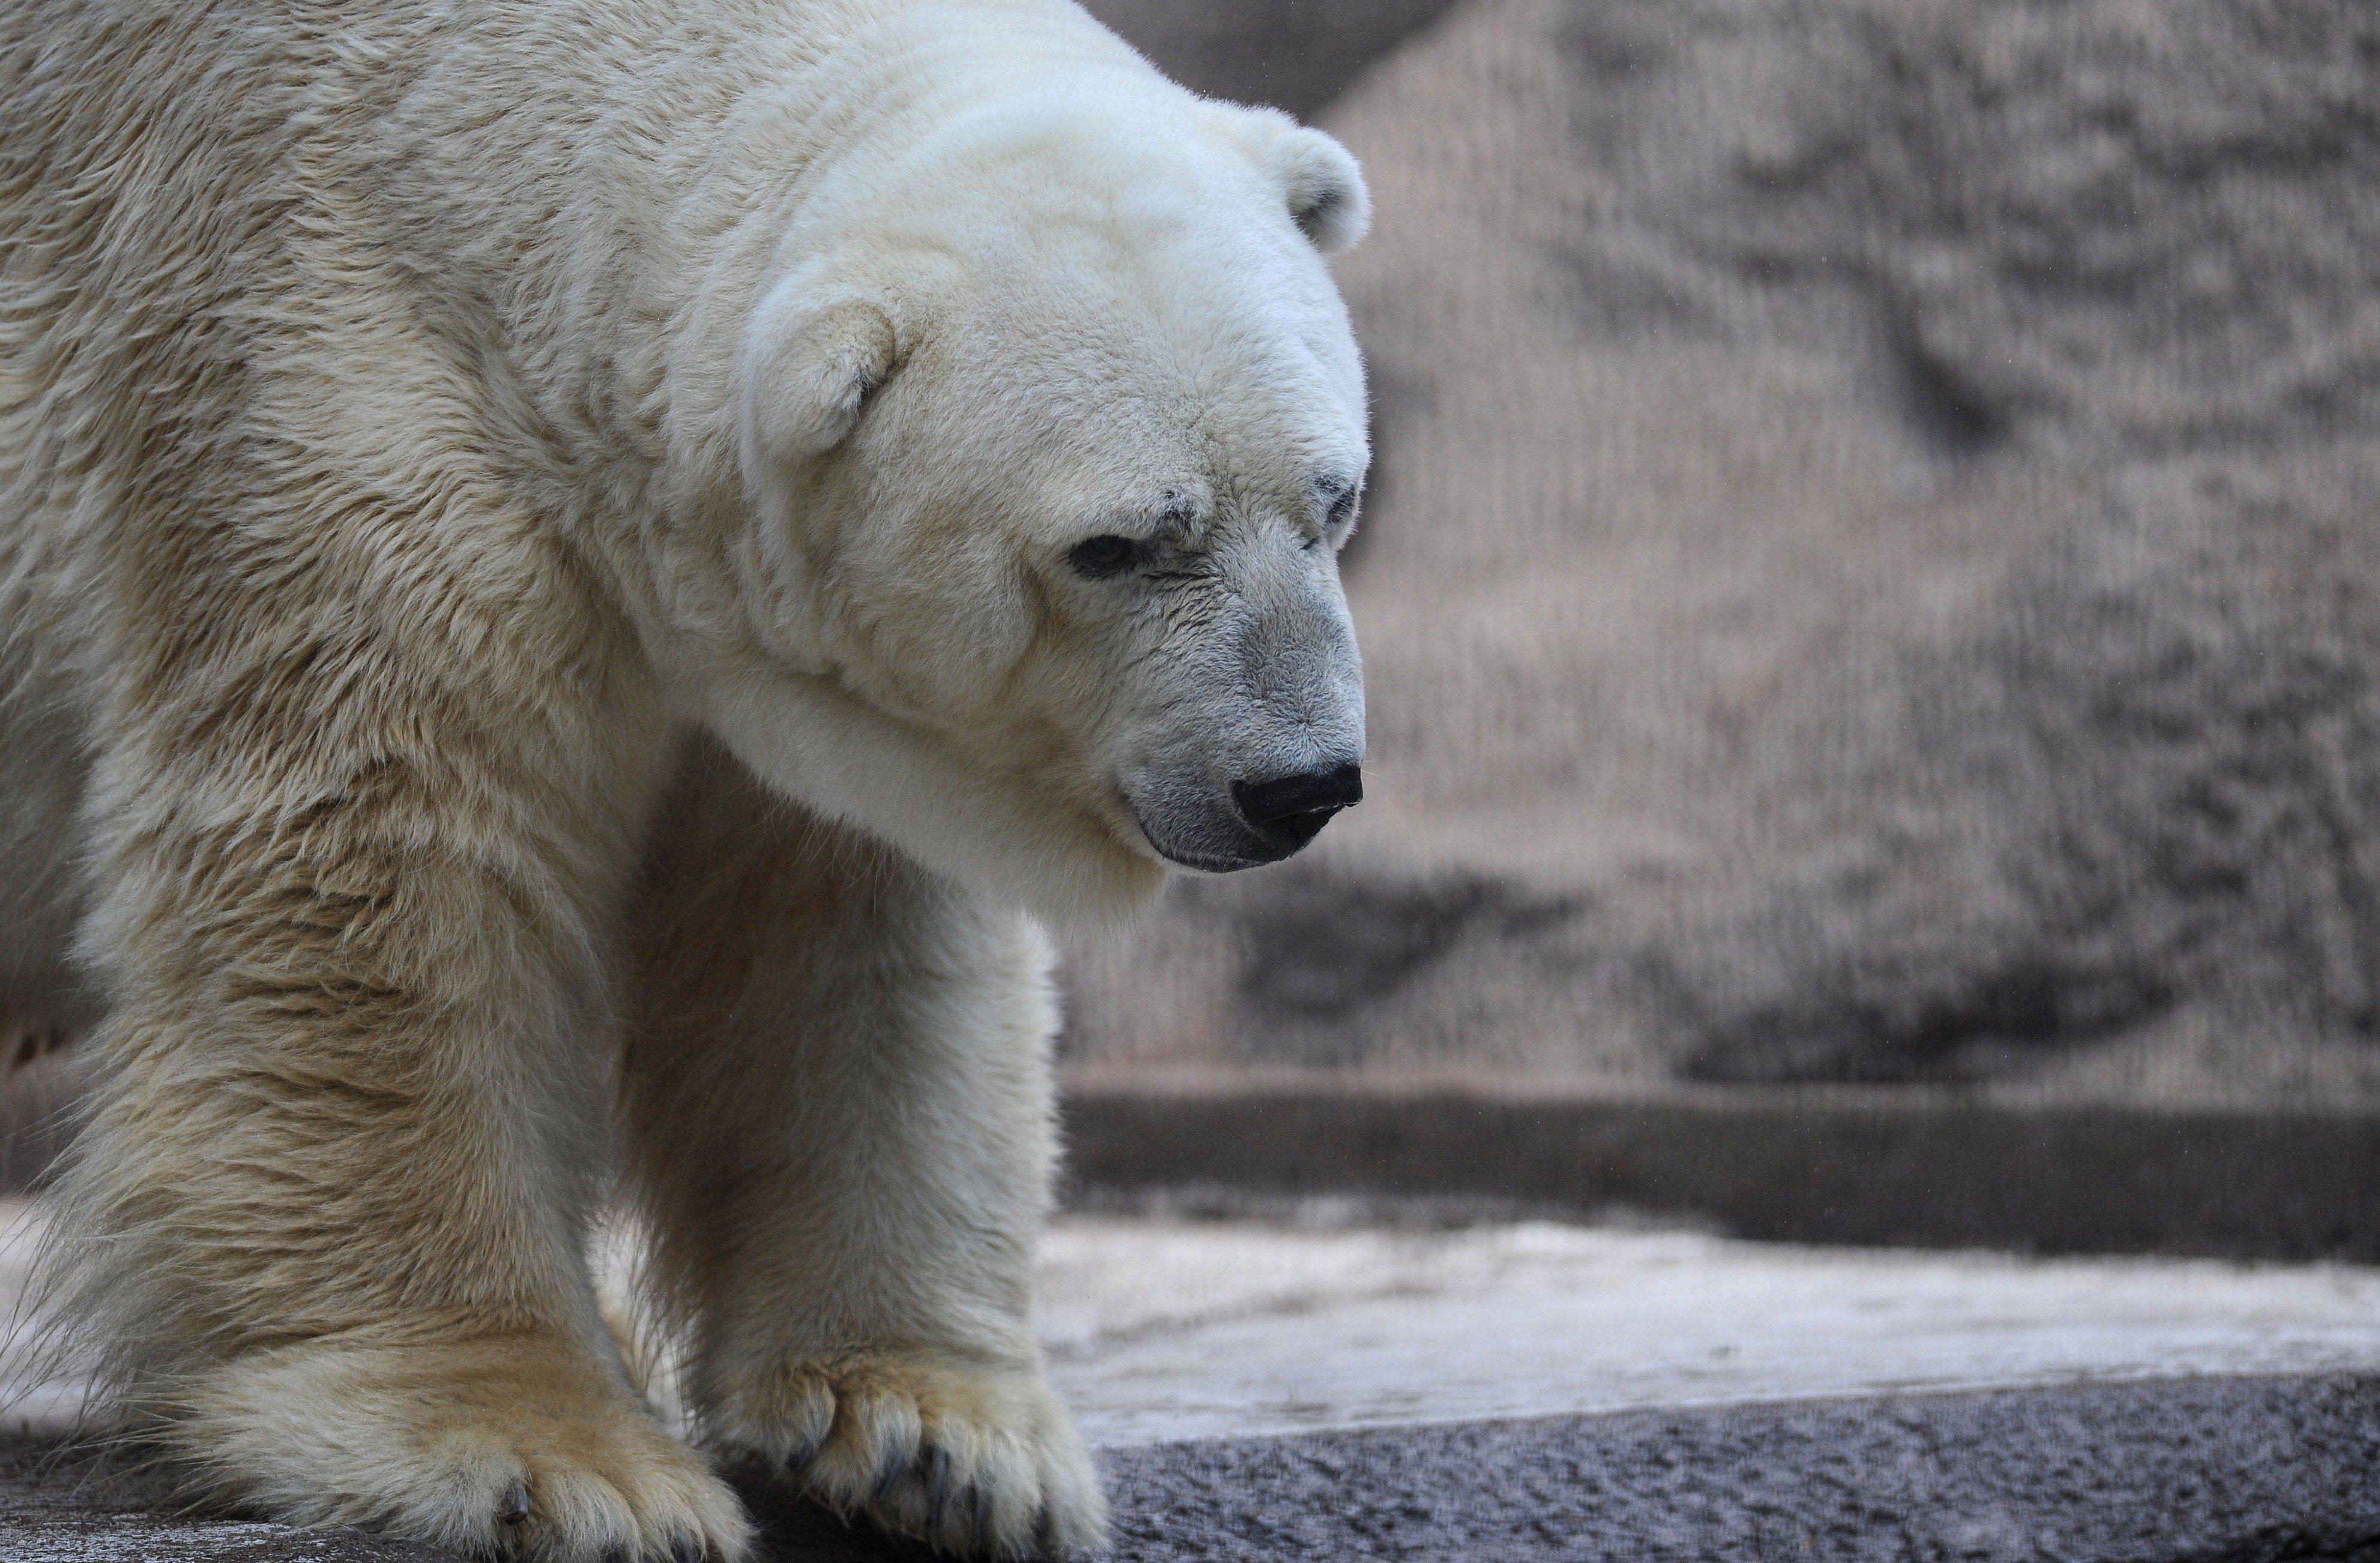 Arturo seen in his enclosure at the Mendoza Zoo in Argentina.